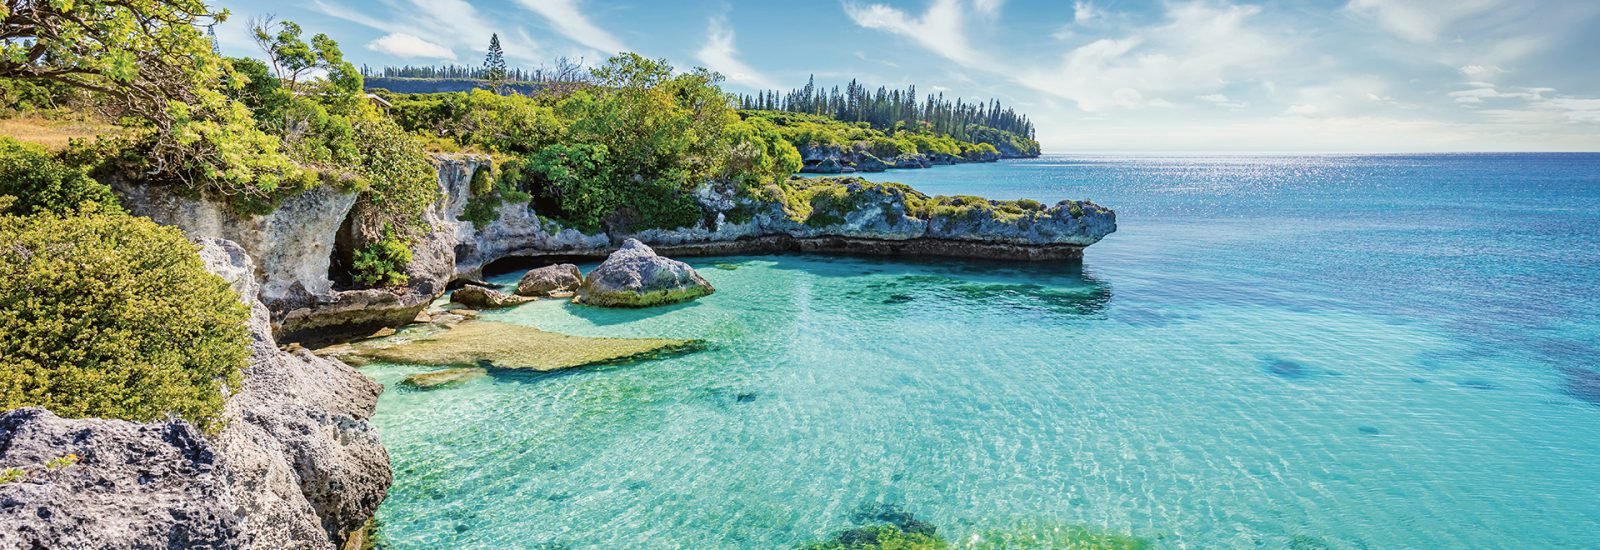 Tadine Bay Lagoon, Maré Island, New Caledonia